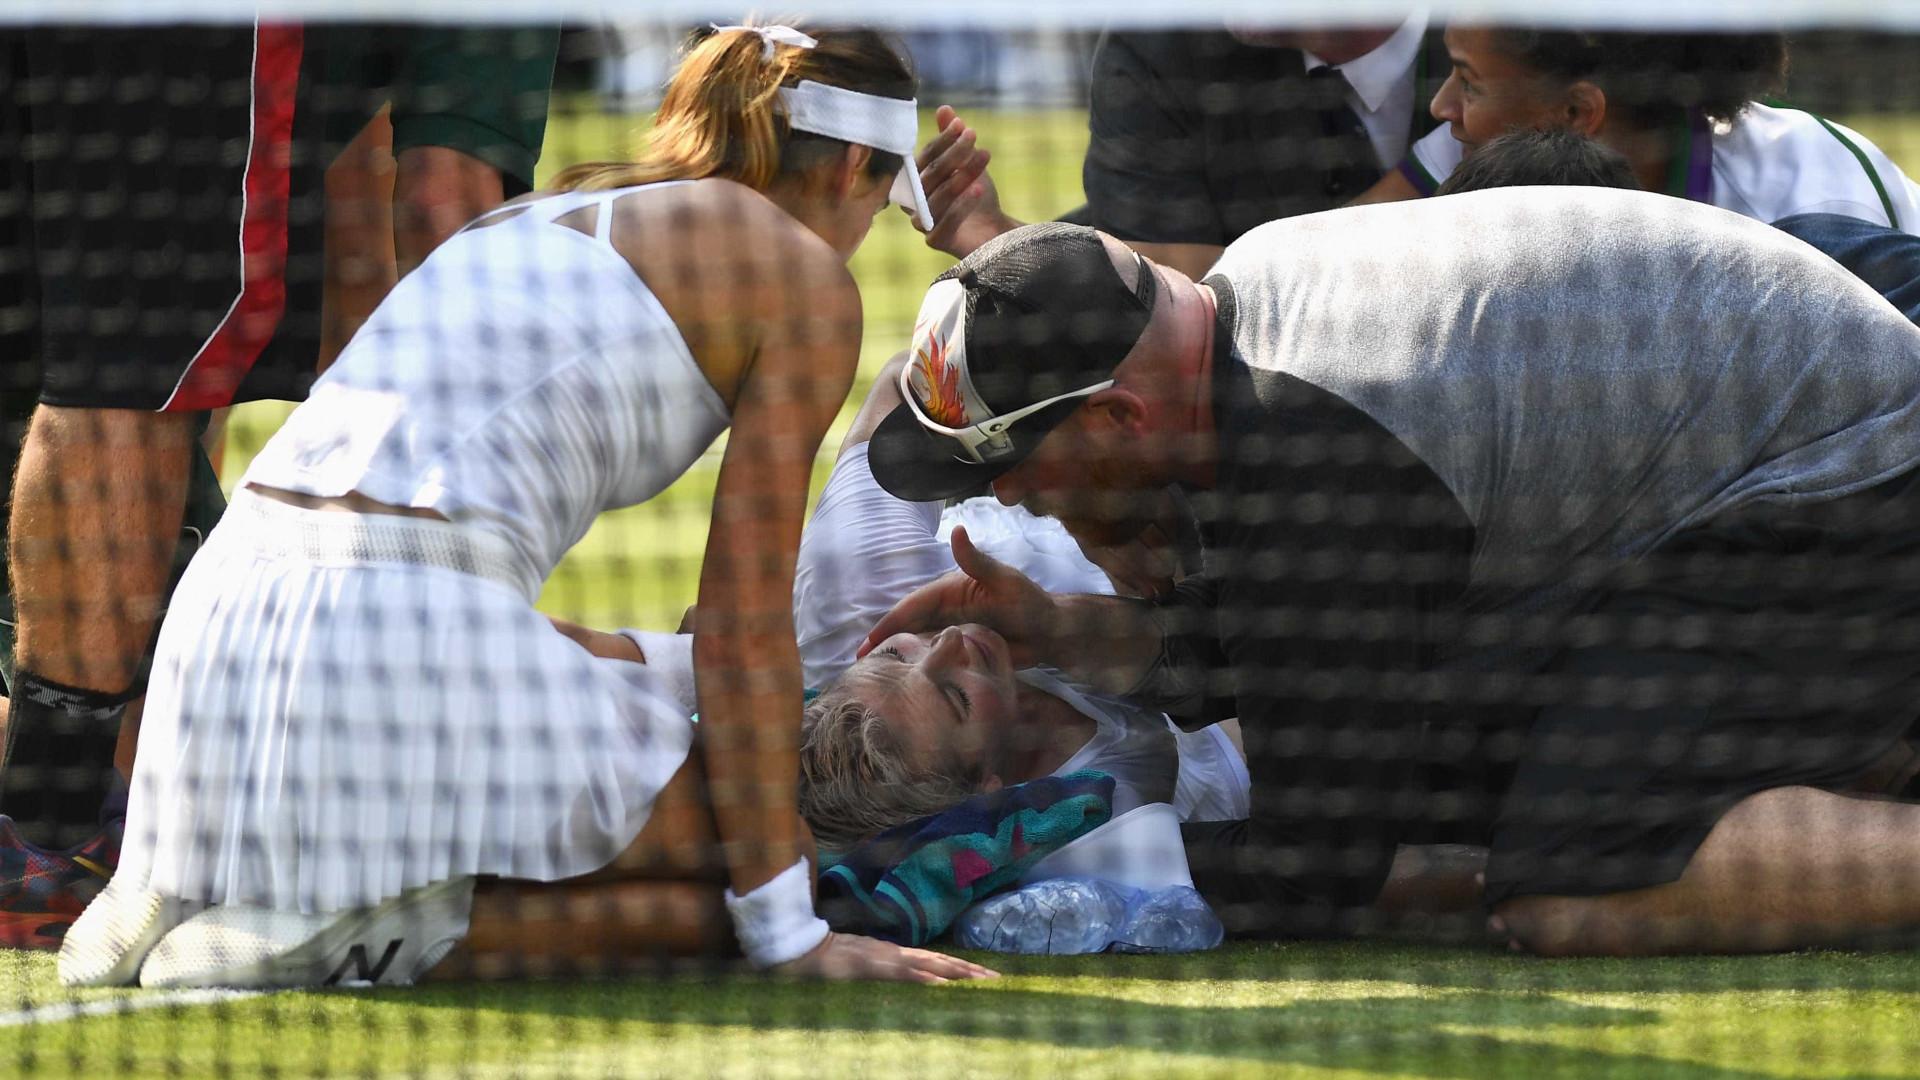 Wimbledon: A lesão arrepiante de Mattek-Sands que a fez gritar por ajuda